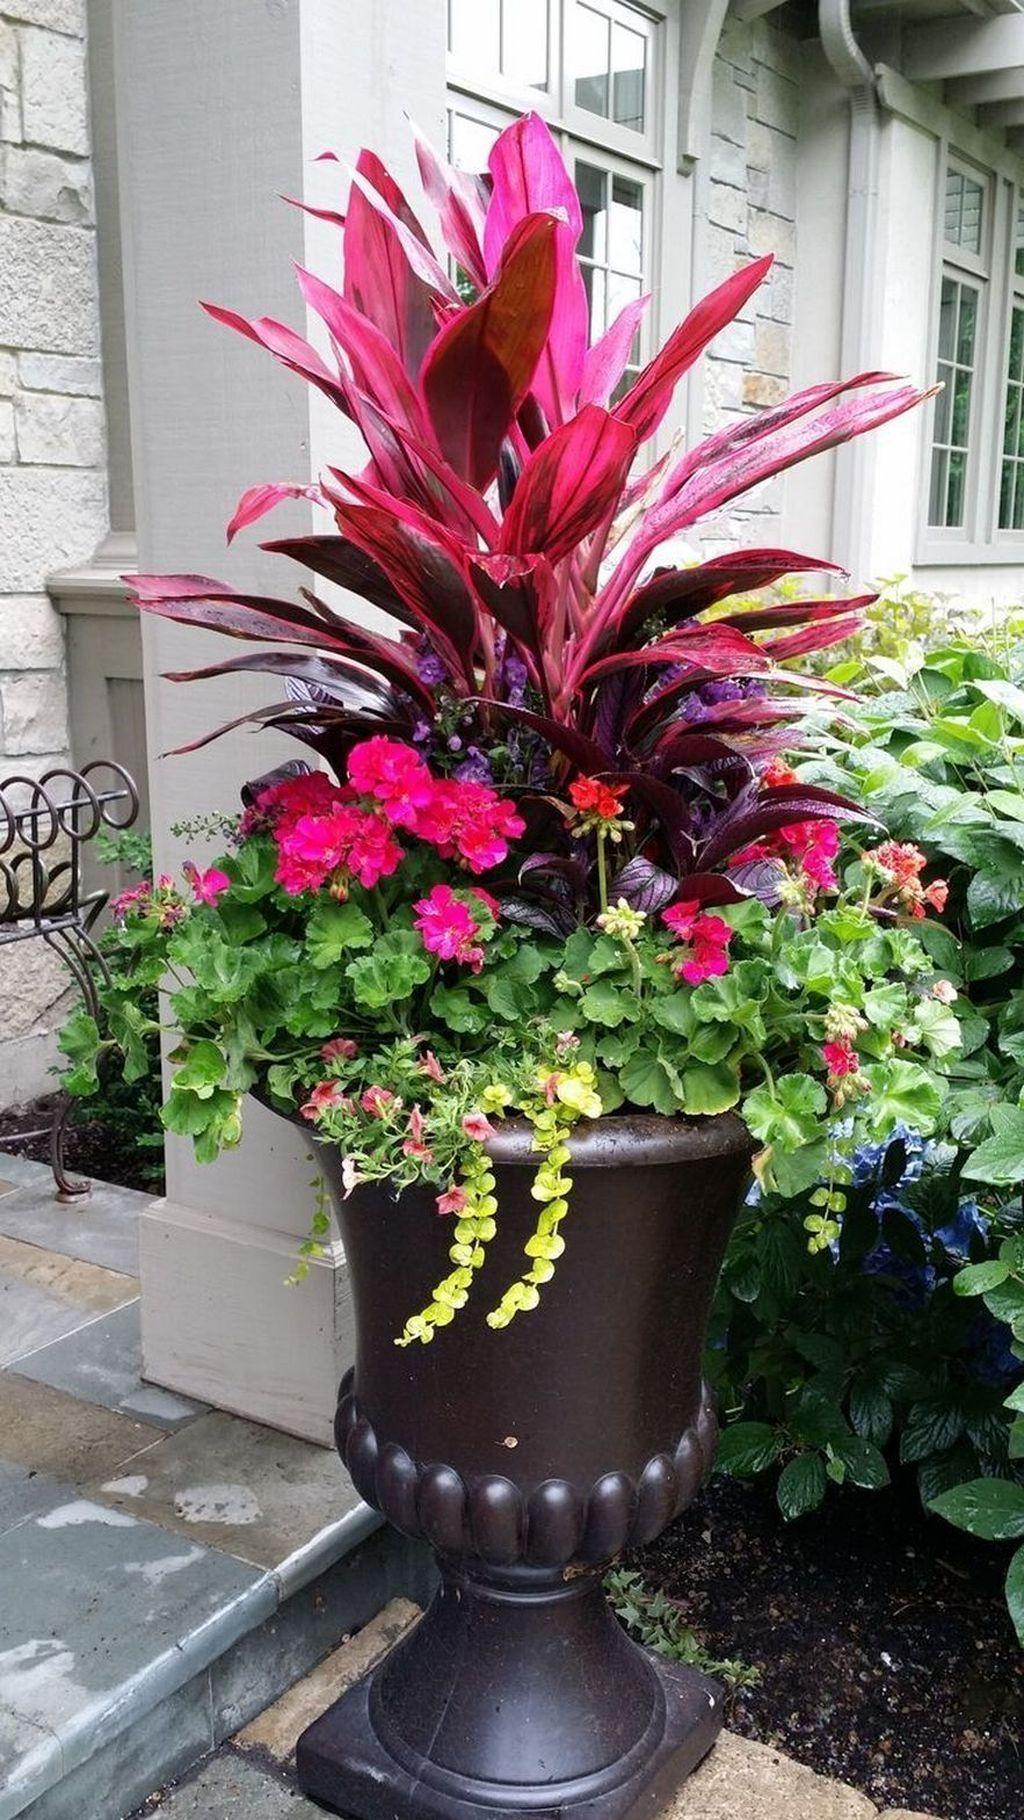 382030d9c2434950066d12b27a7fd7c4 - Best Soil To Use For Container Gardening